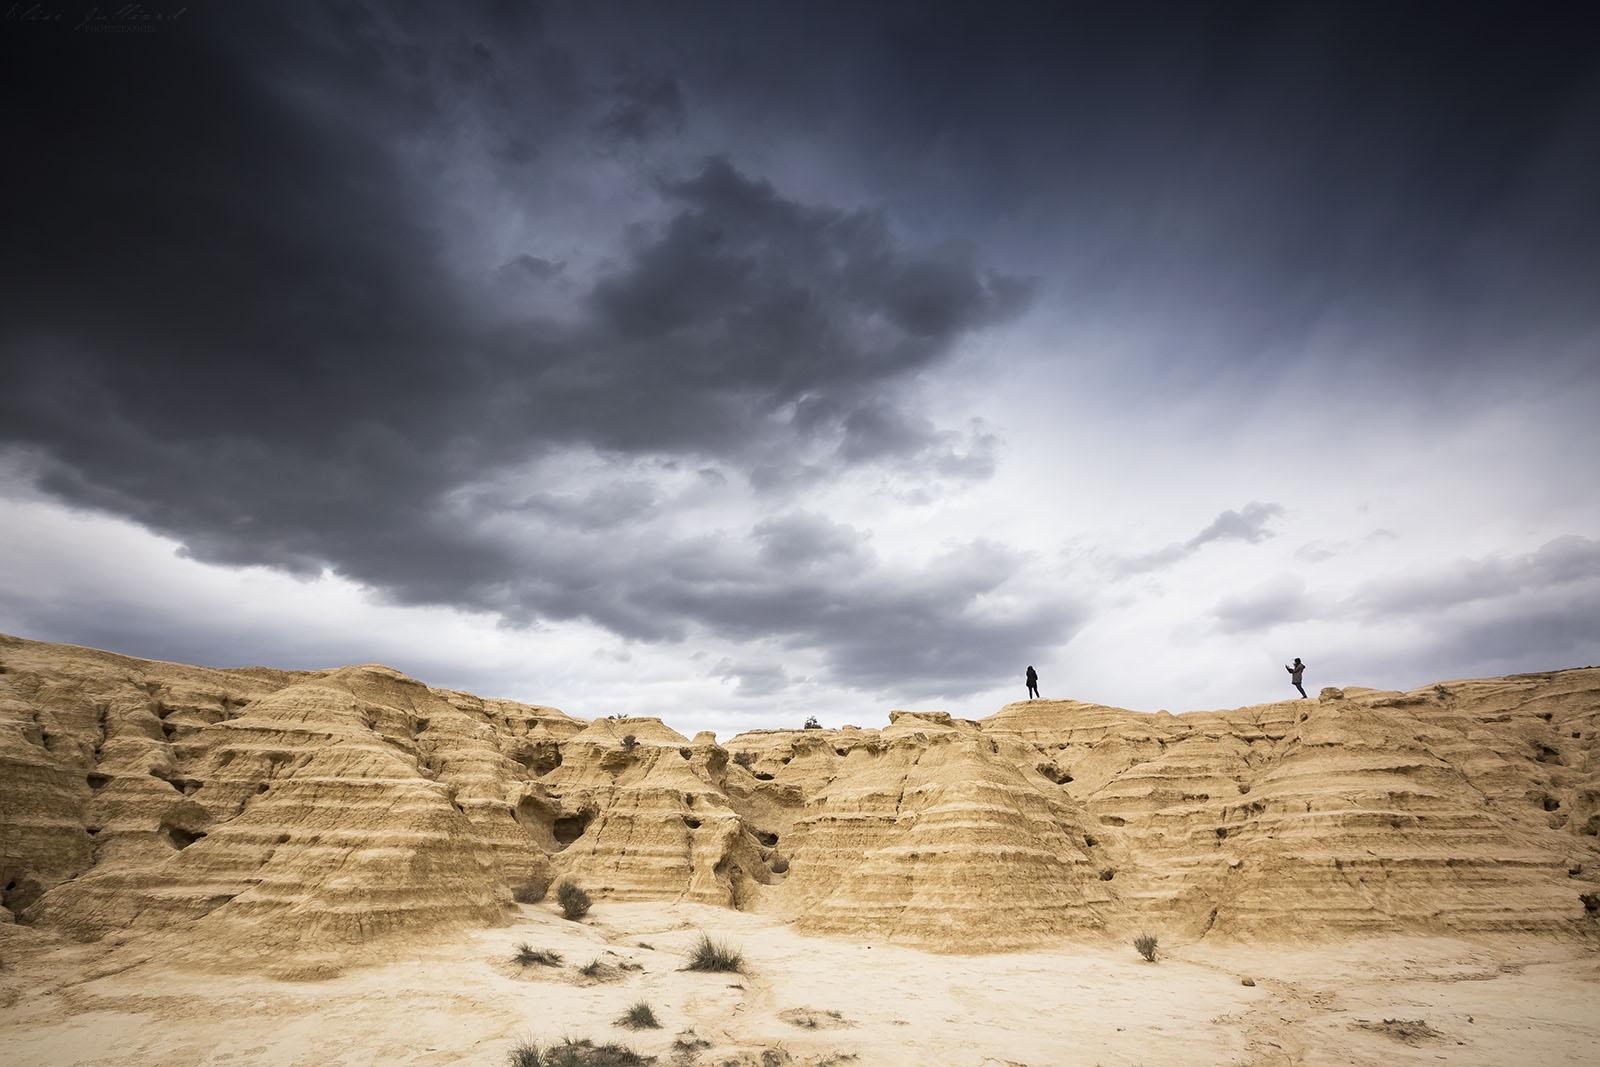 elise-julliard-photographe-lyon-voyage-roadtrip-travel-espagne-aventures-journal-route-tudela-bardenas-reales-navarre-arguedas-desert